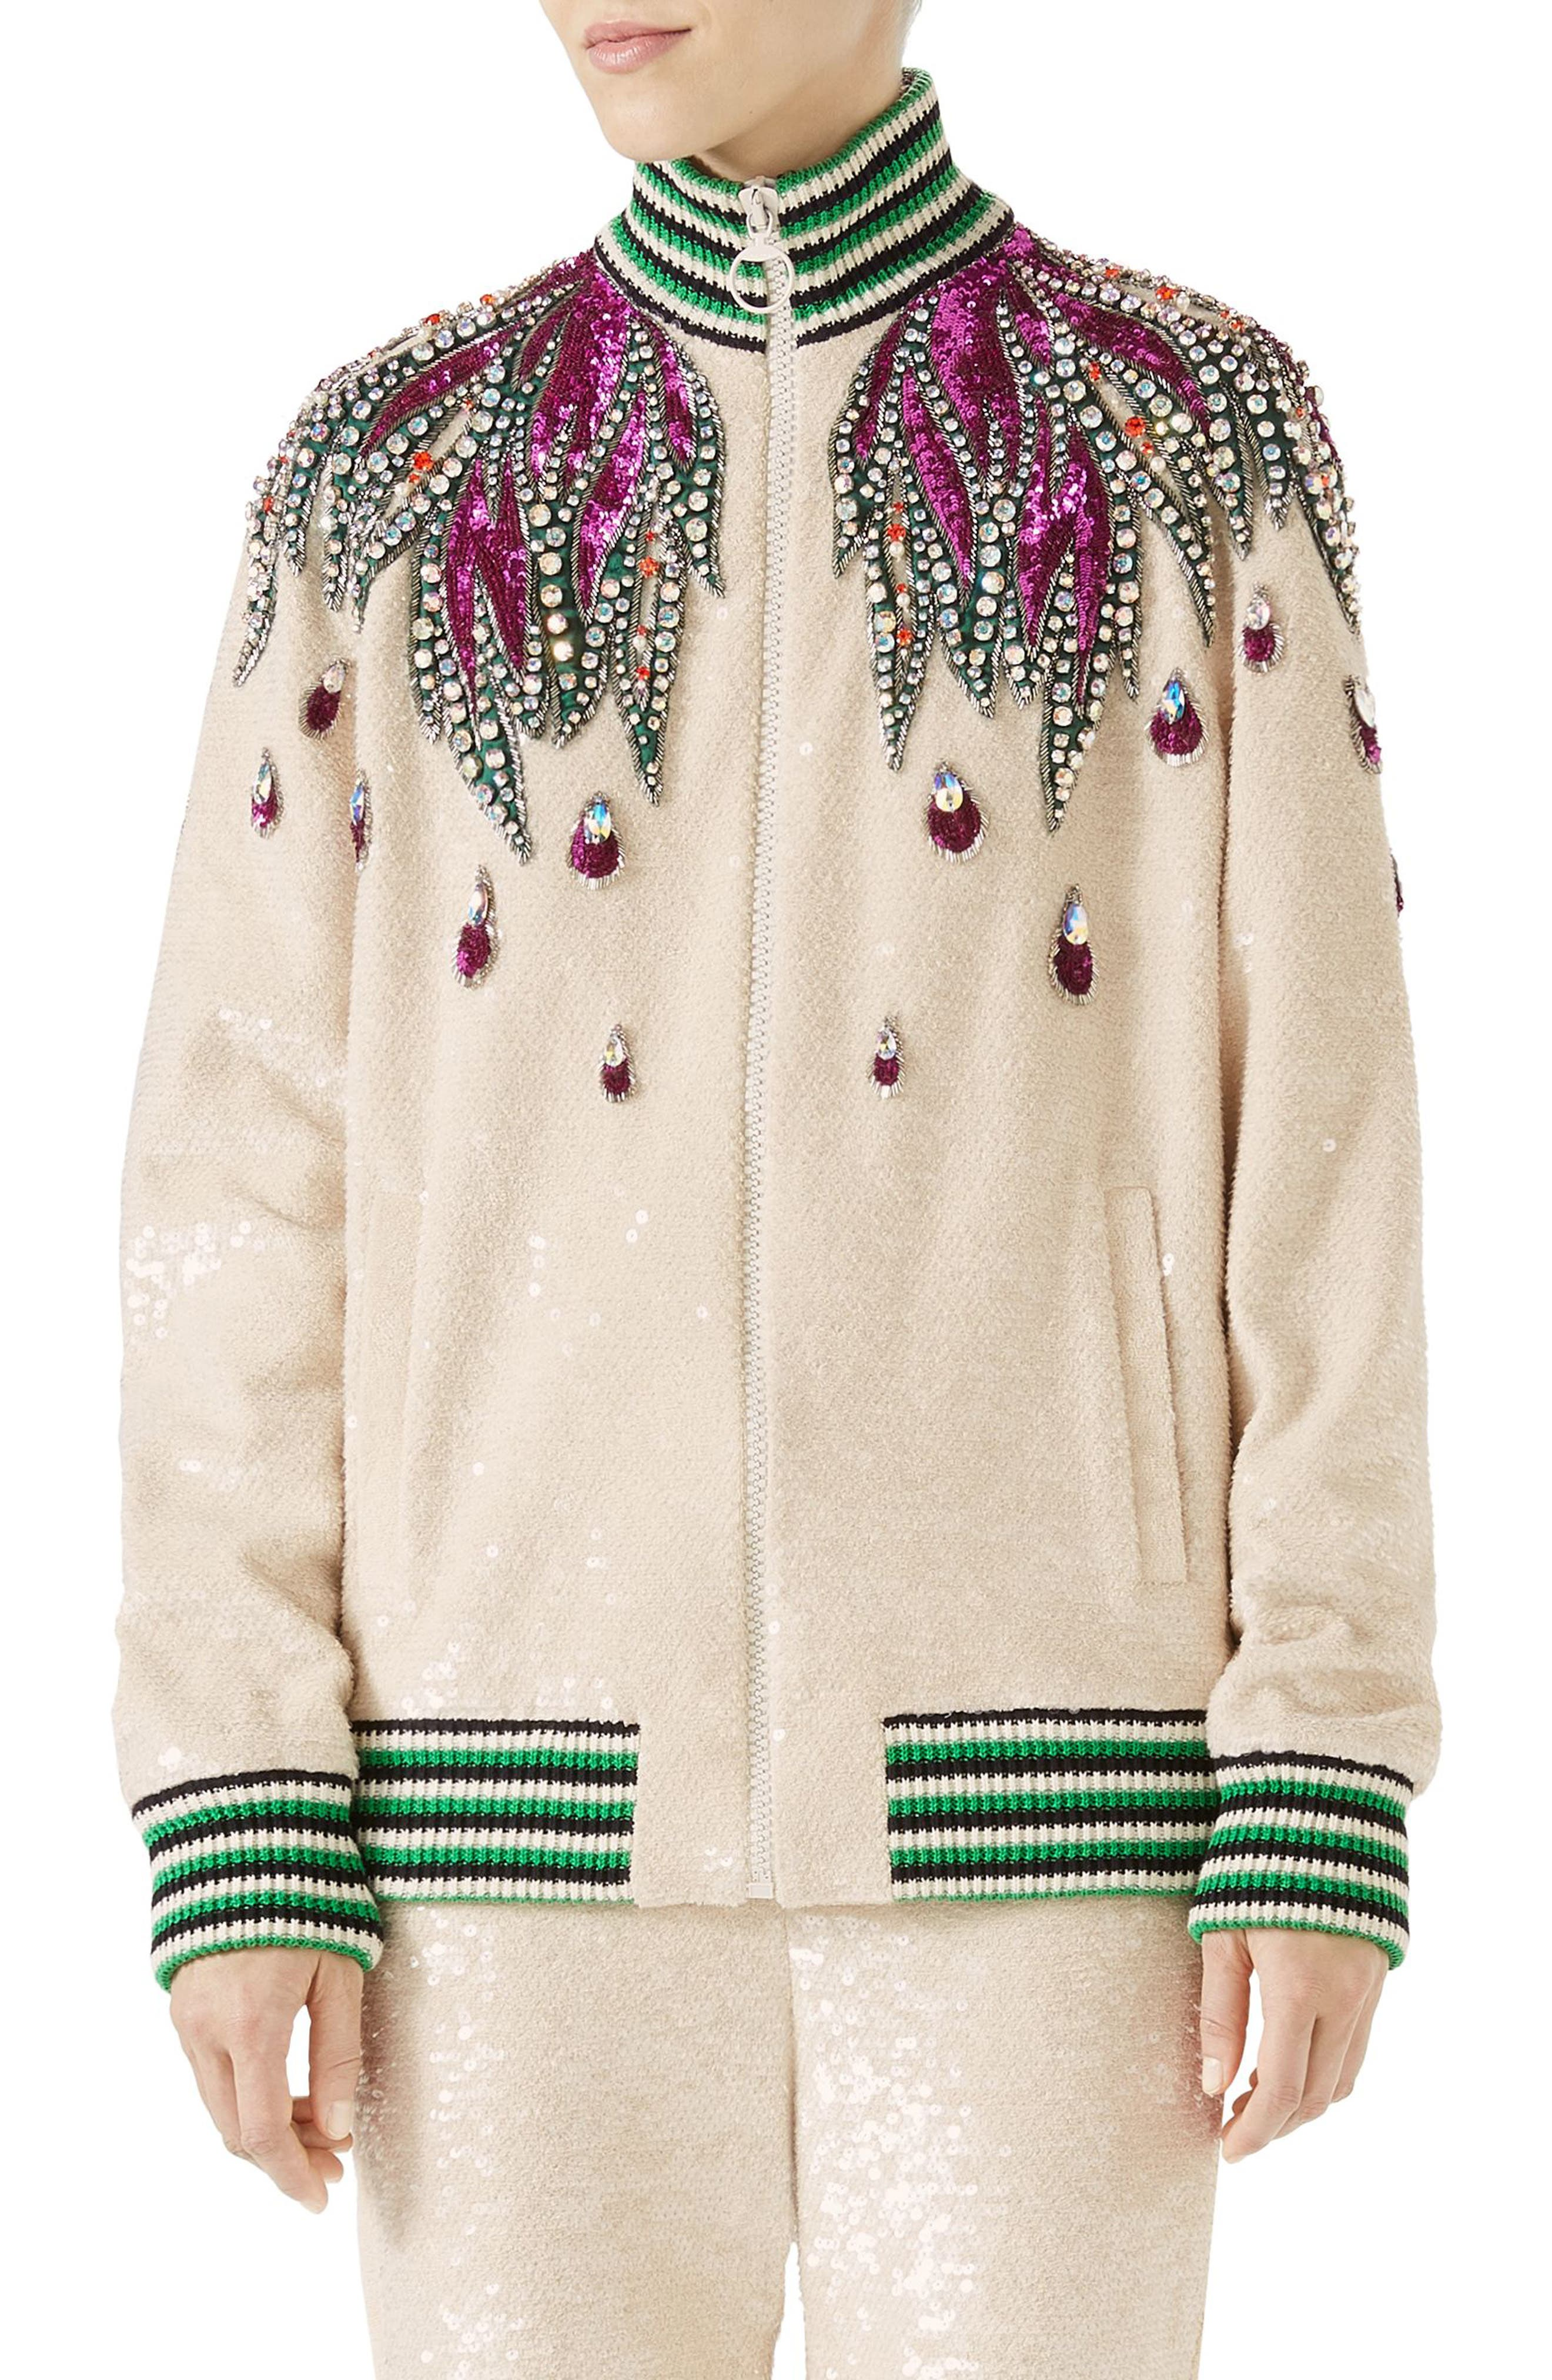 Main Image - Gucci Embellished Track Jacket